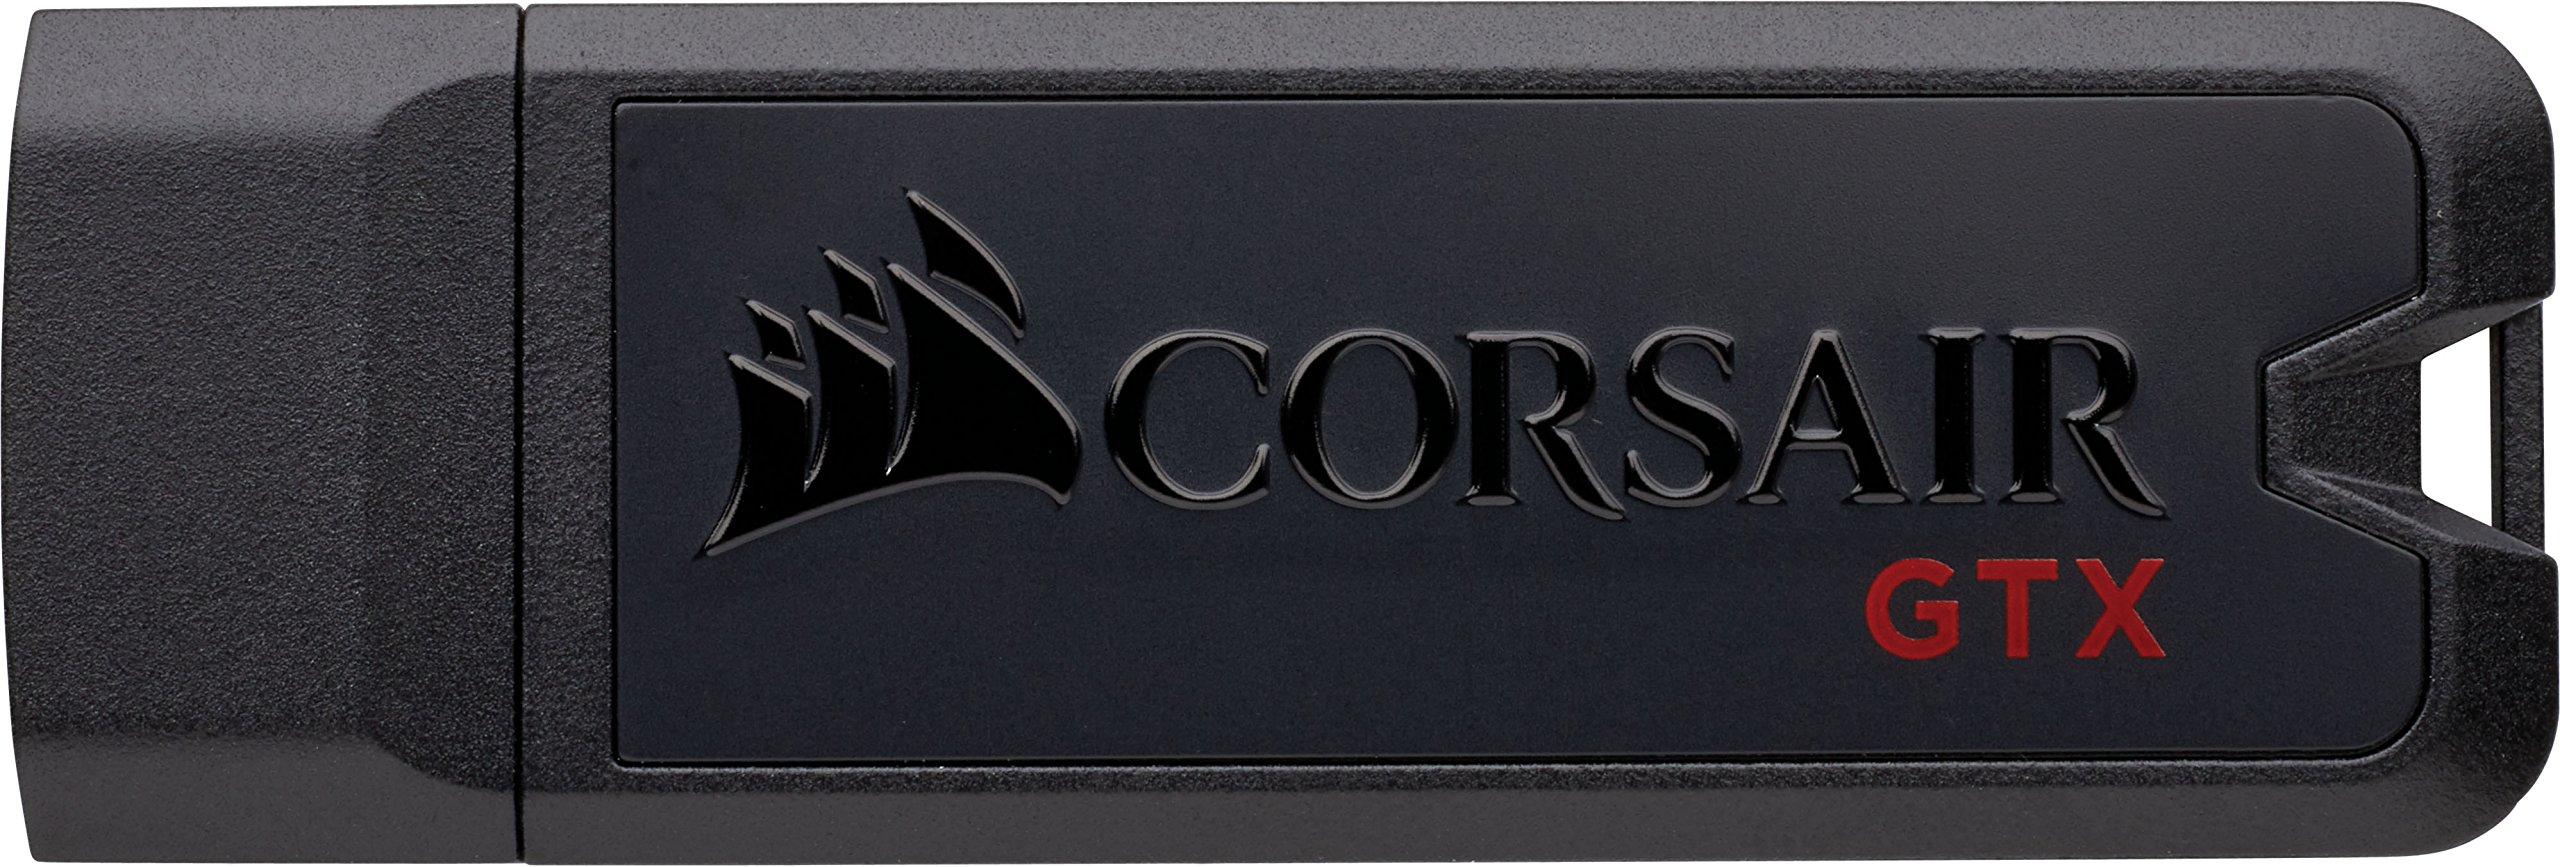 Corsair Flash Voyager GTX 128GB USB 3.1 Premium Flash Drive by Corsair (Image #5)